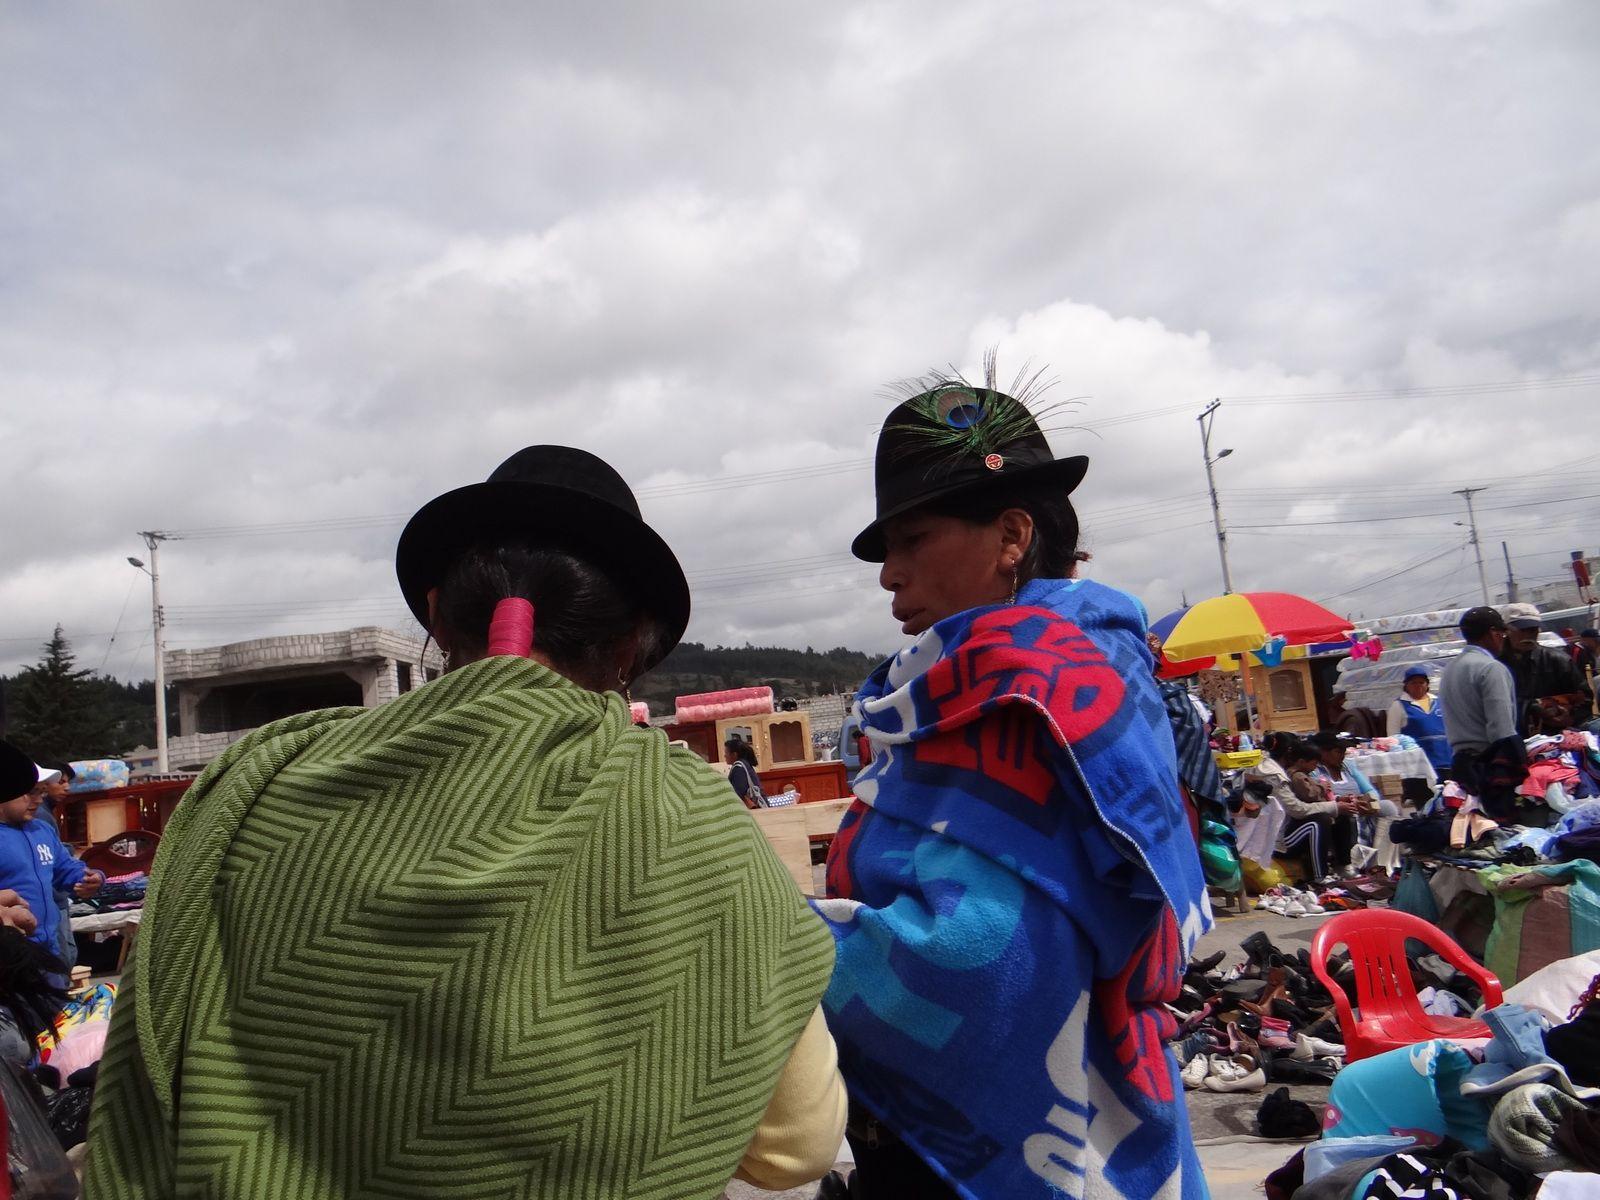 Voyage Equateur 2014. Quito. Otavalo. Boucle de Quilotoa